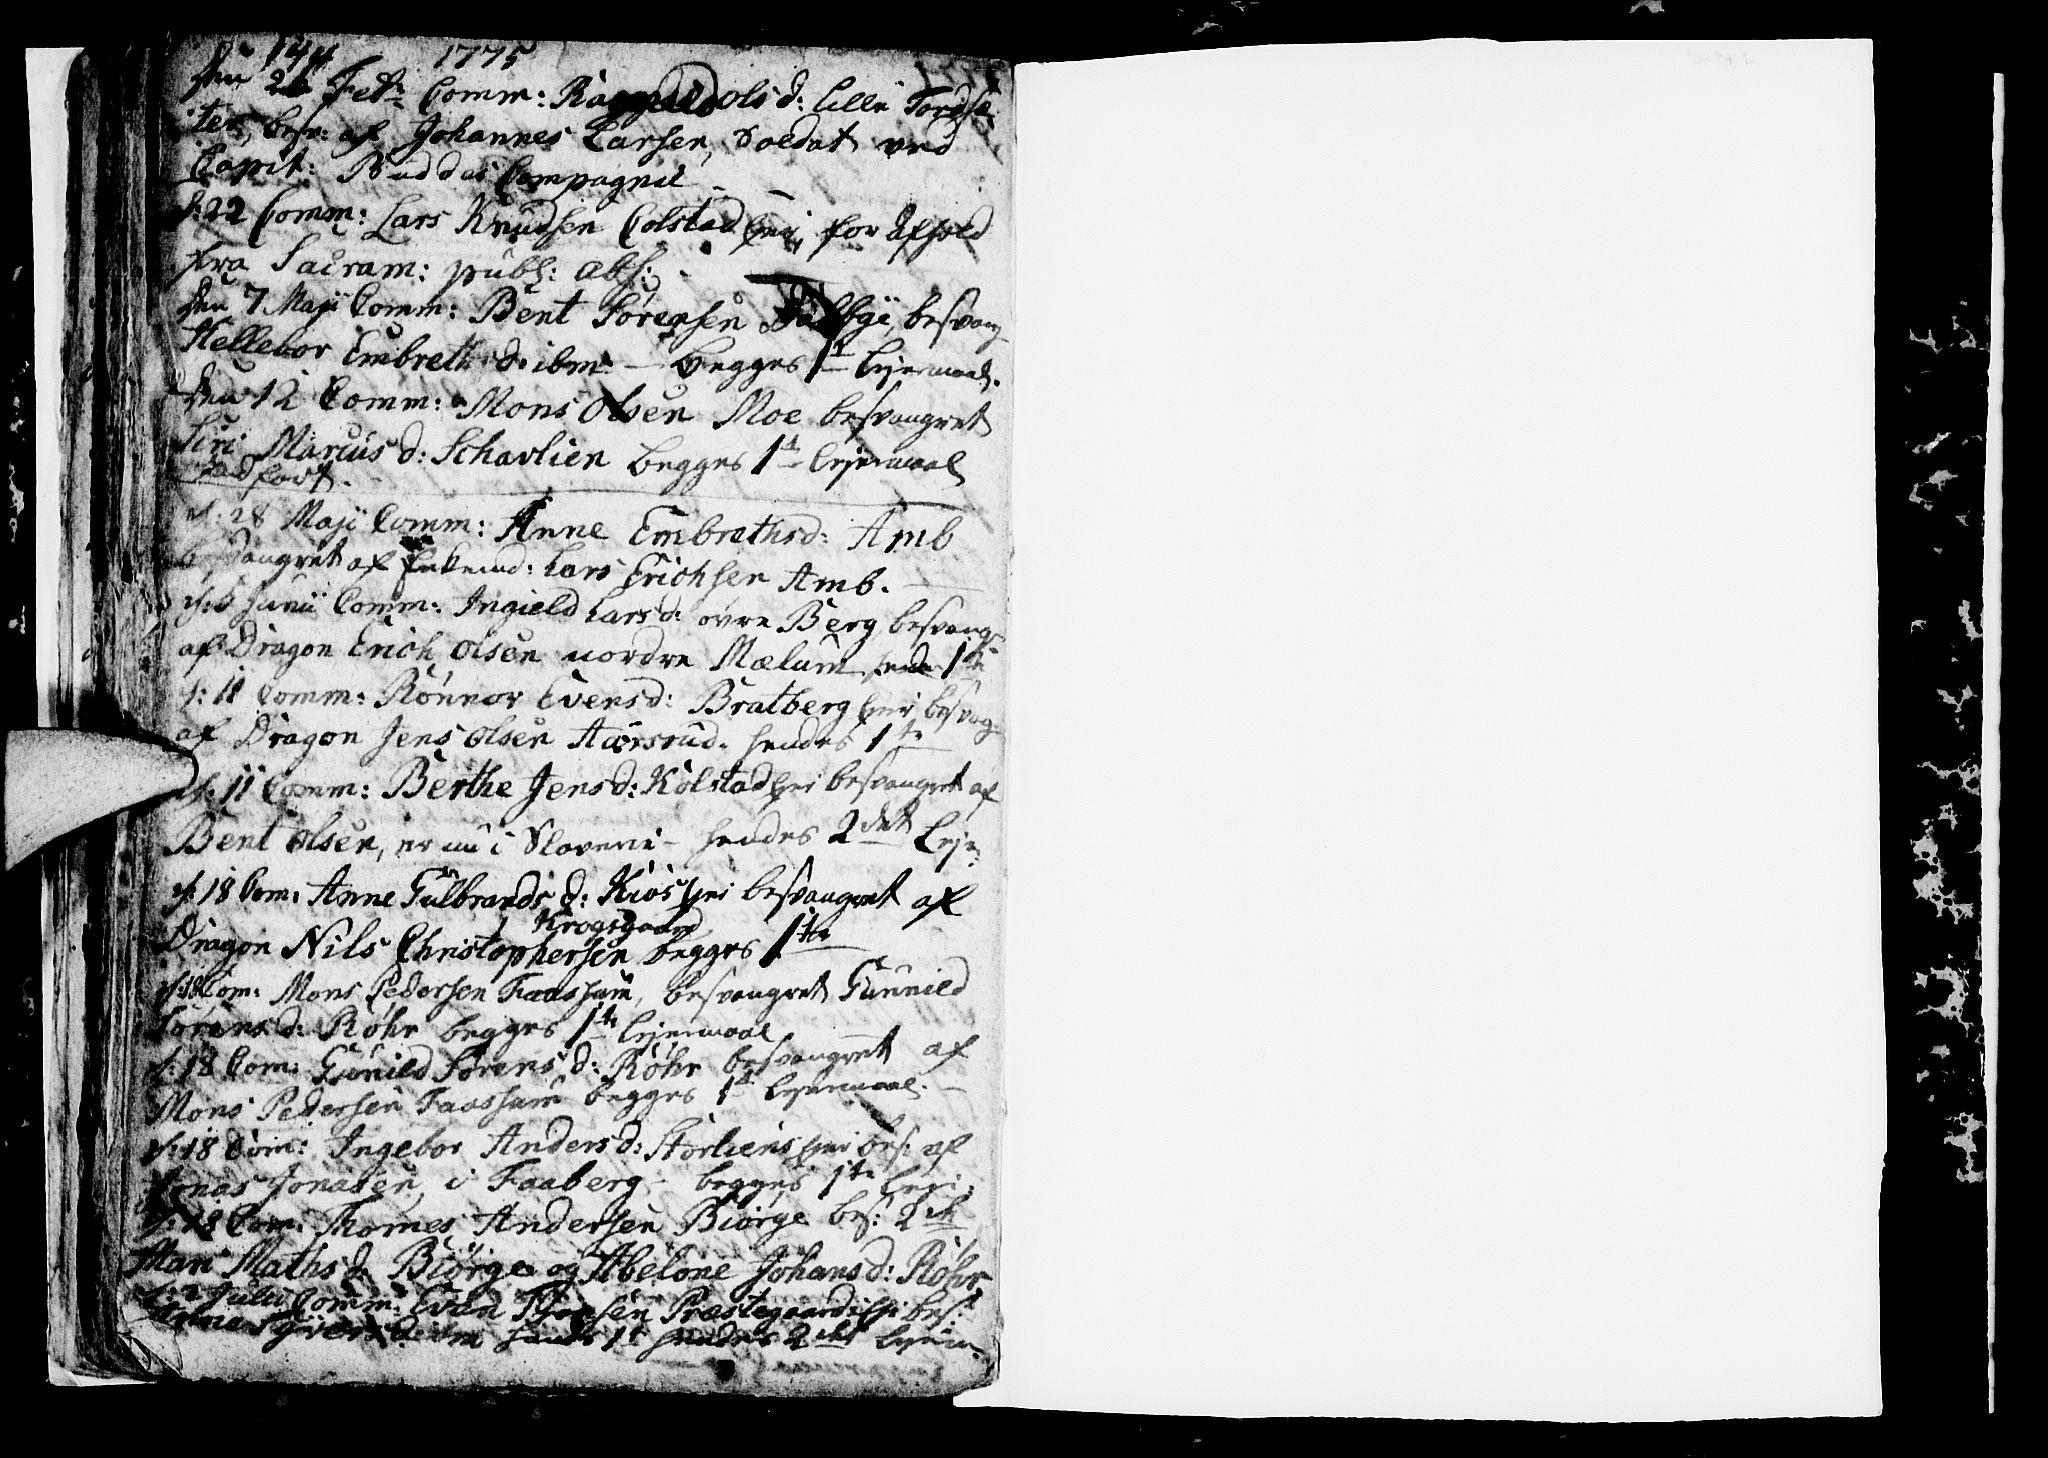 SAH, Ringsaker prestekontor, I/Ia/L0005/0001: Kladd til kirkebok nr. 1A, 1773-1775, s. 144-145